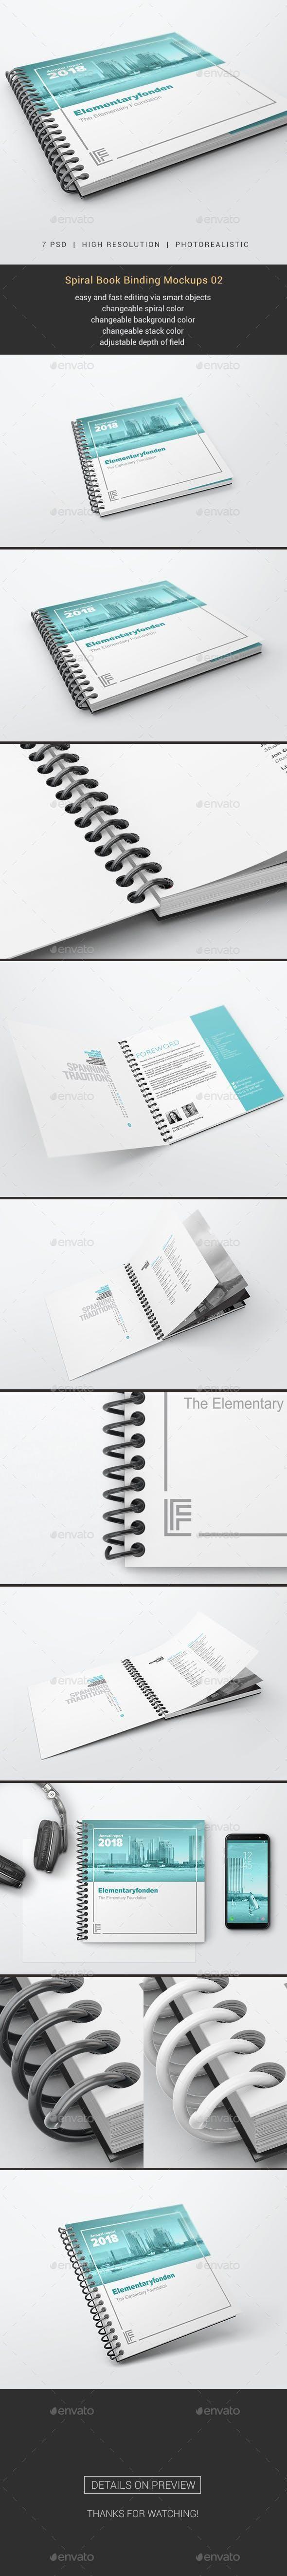 Spiral Book Binding Mockups 02 Spiral Book Binding Book Binding Brochure Design